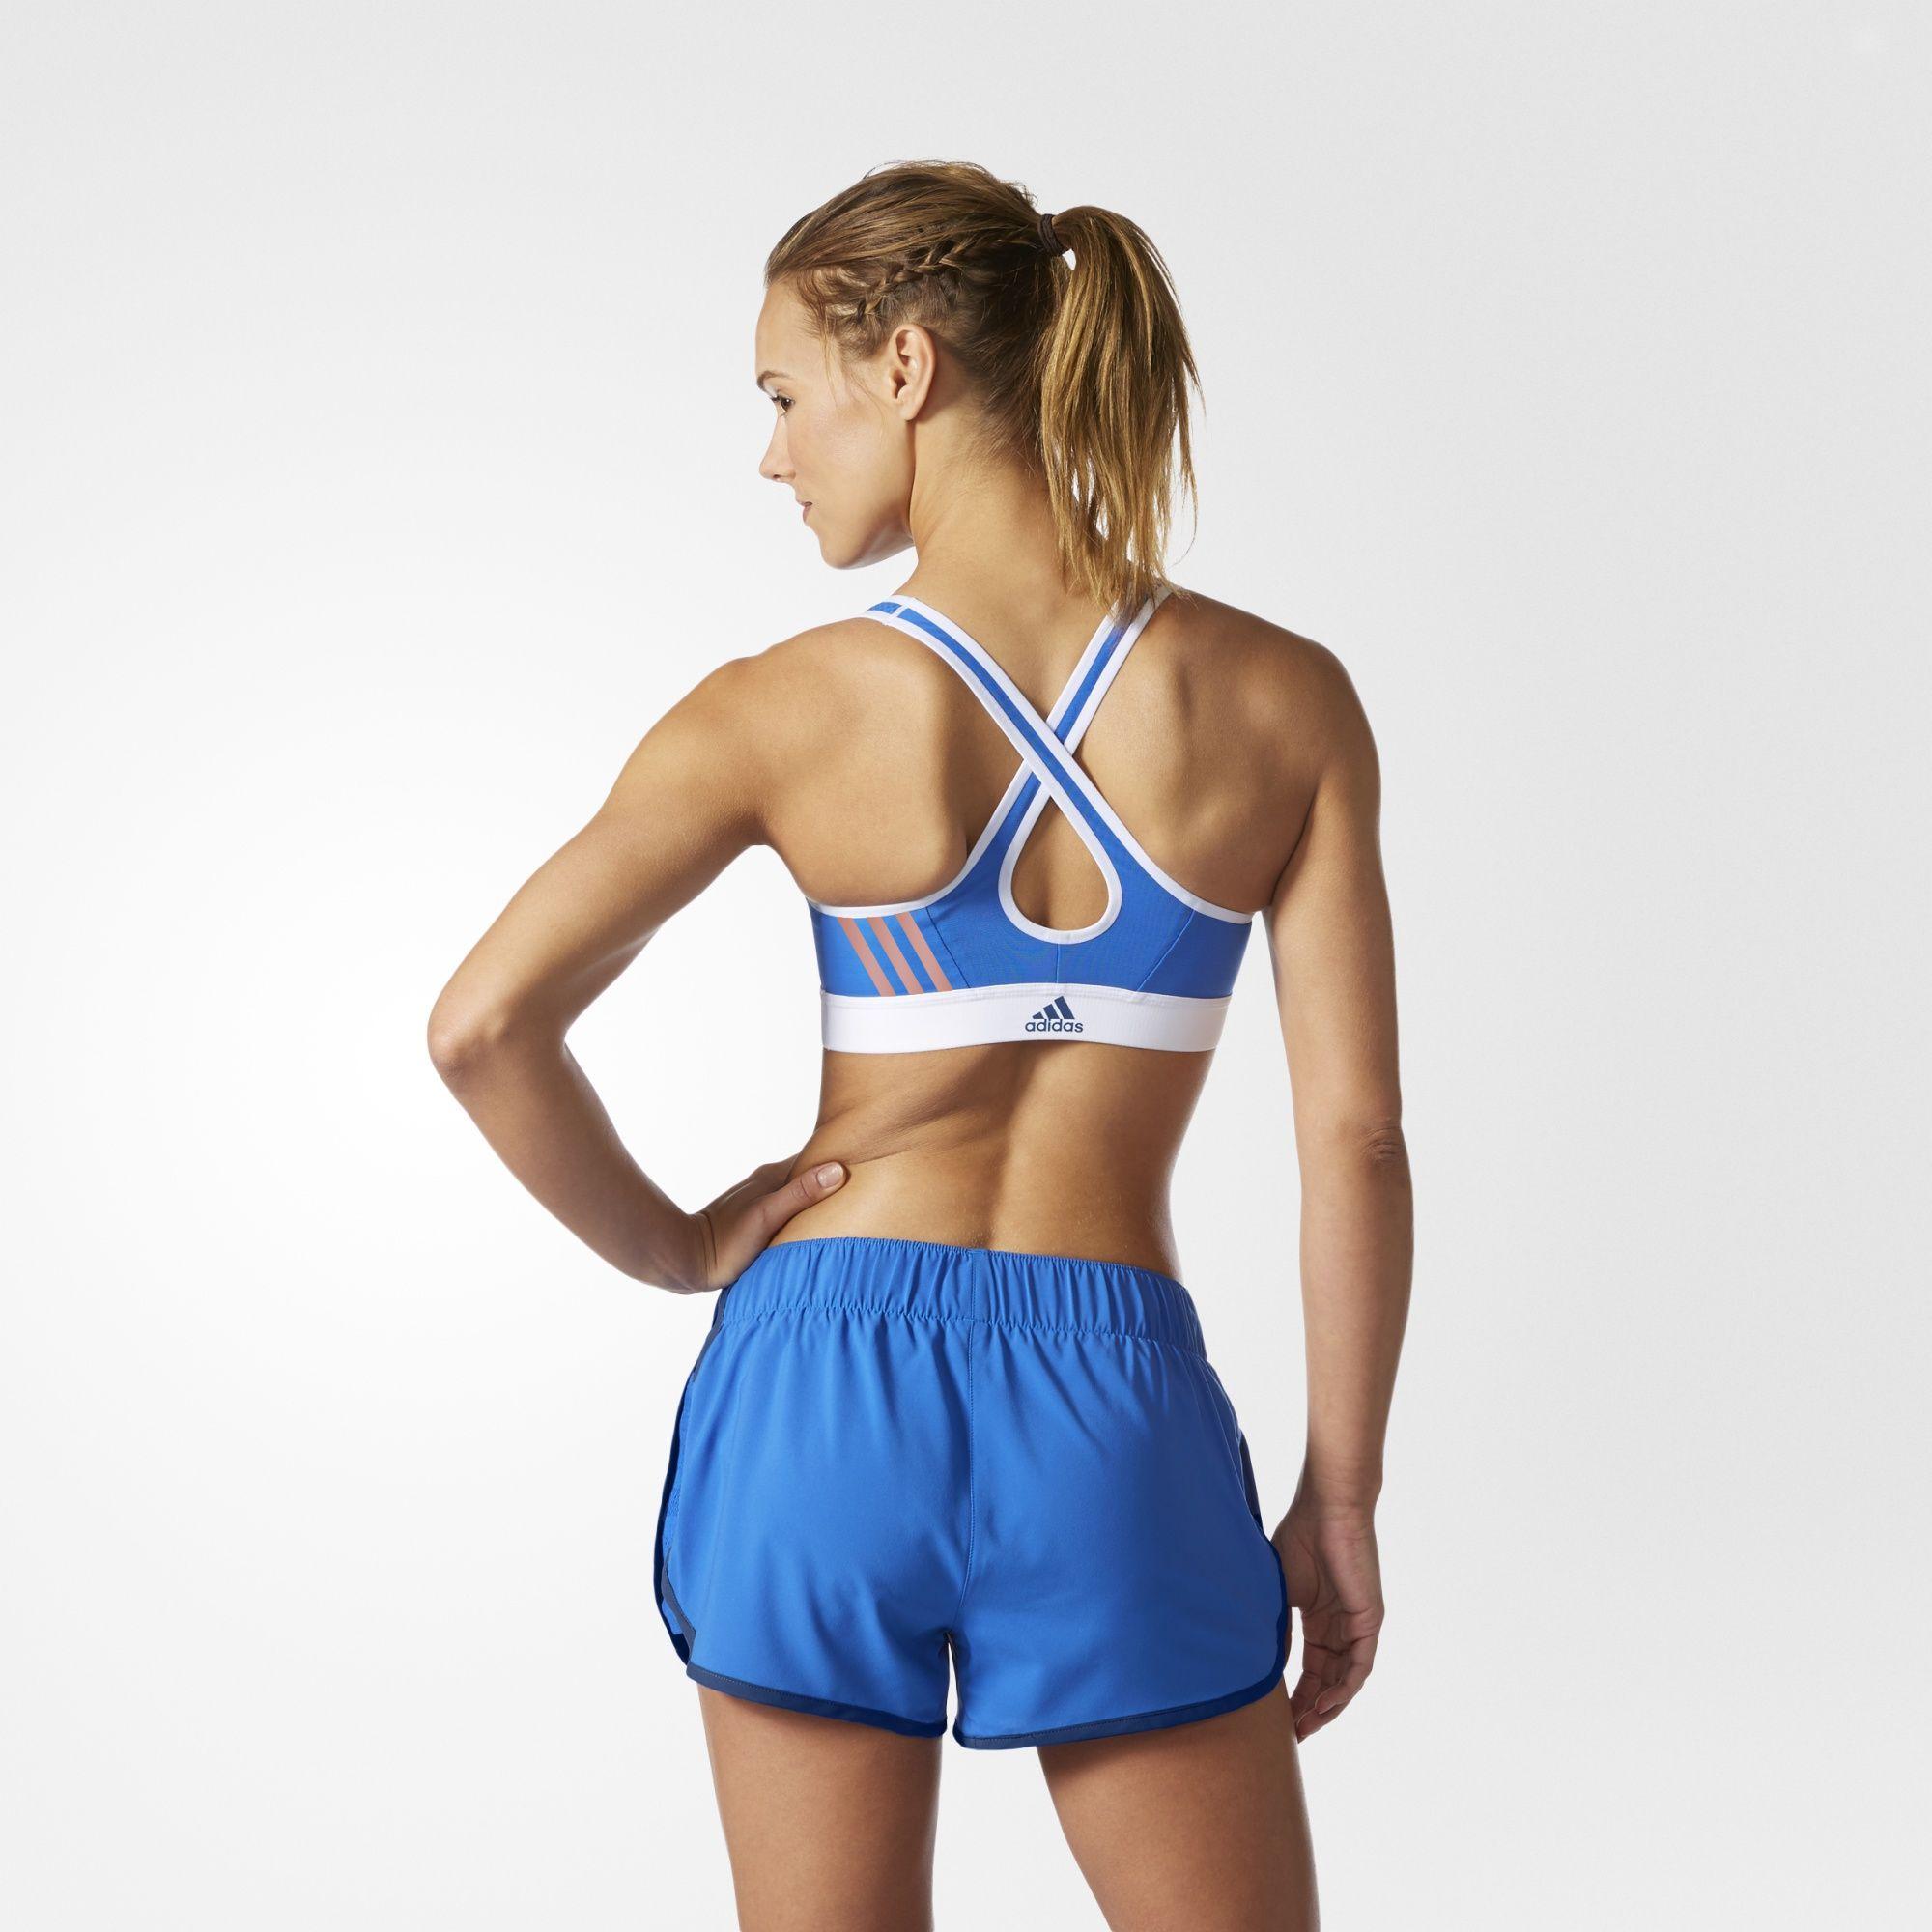 929a8e7baab adidas - Boston Marathon® Supernova X Bra